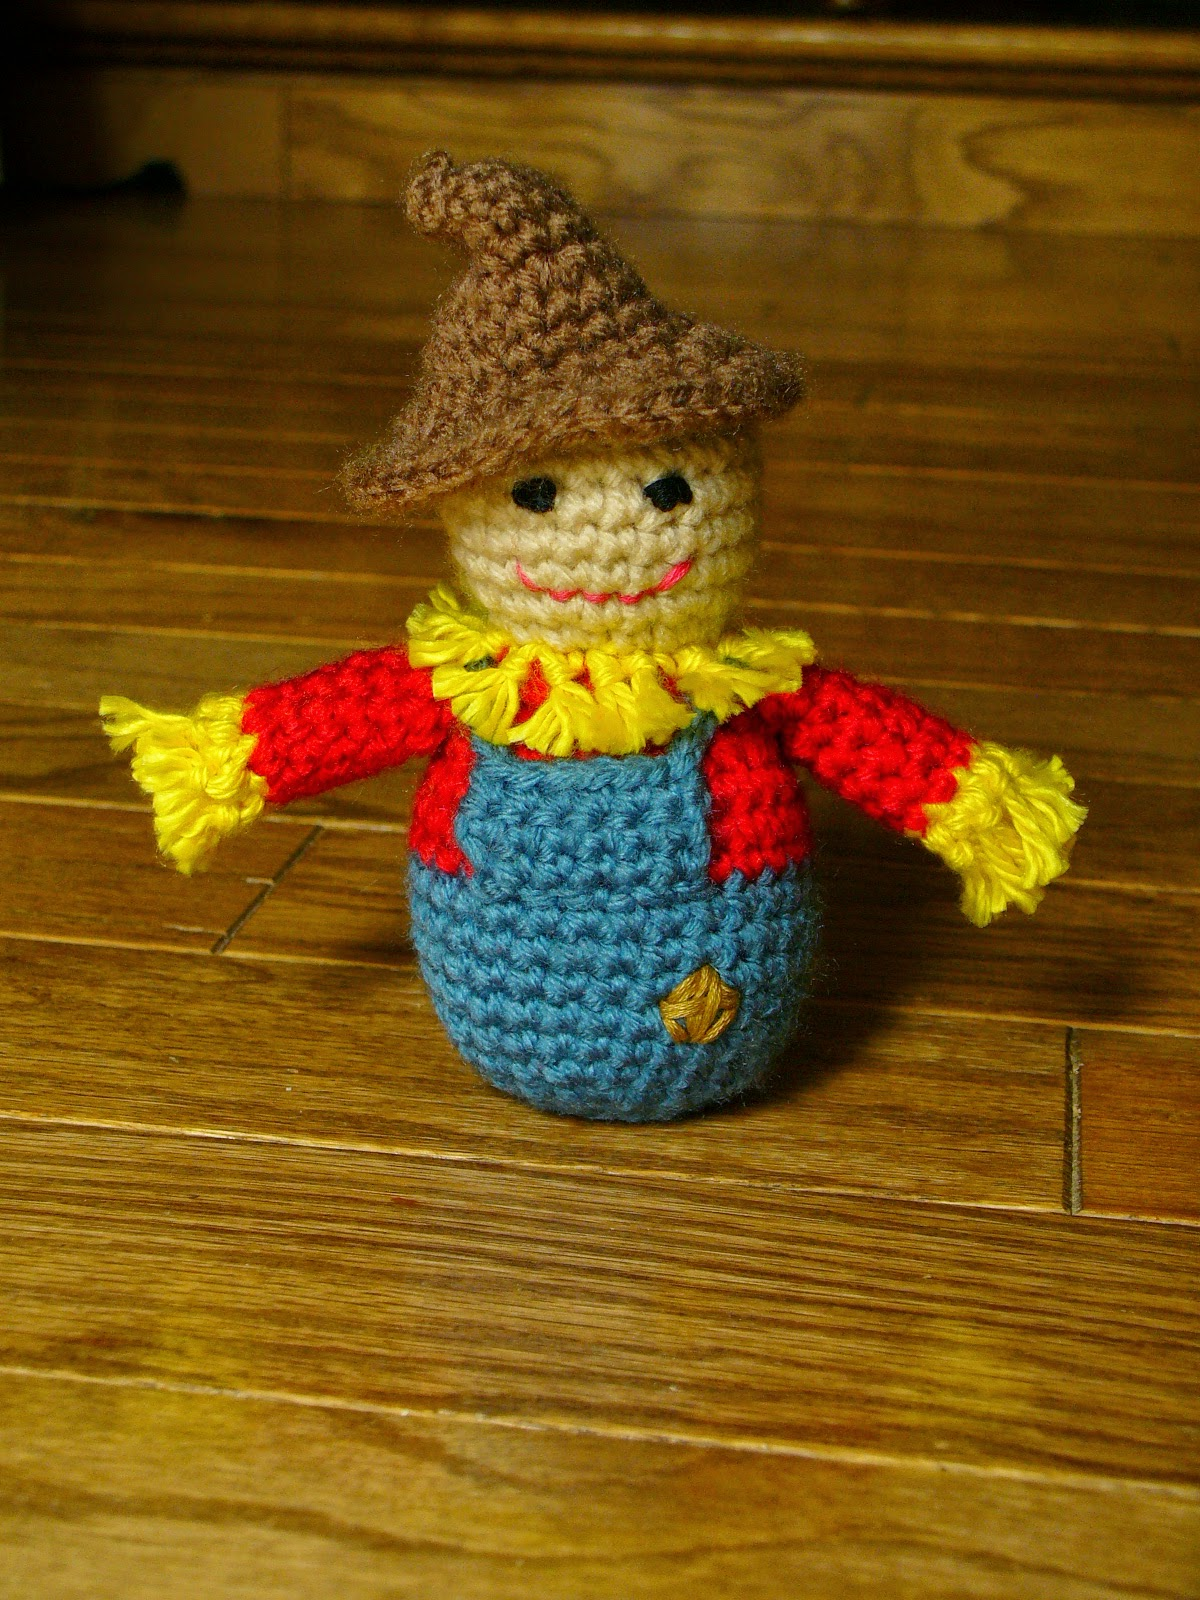 Quick Free Amigurumi Patterns : Little Scarecrow Amigurumi Free Crochet Pattern ? Crochet ...